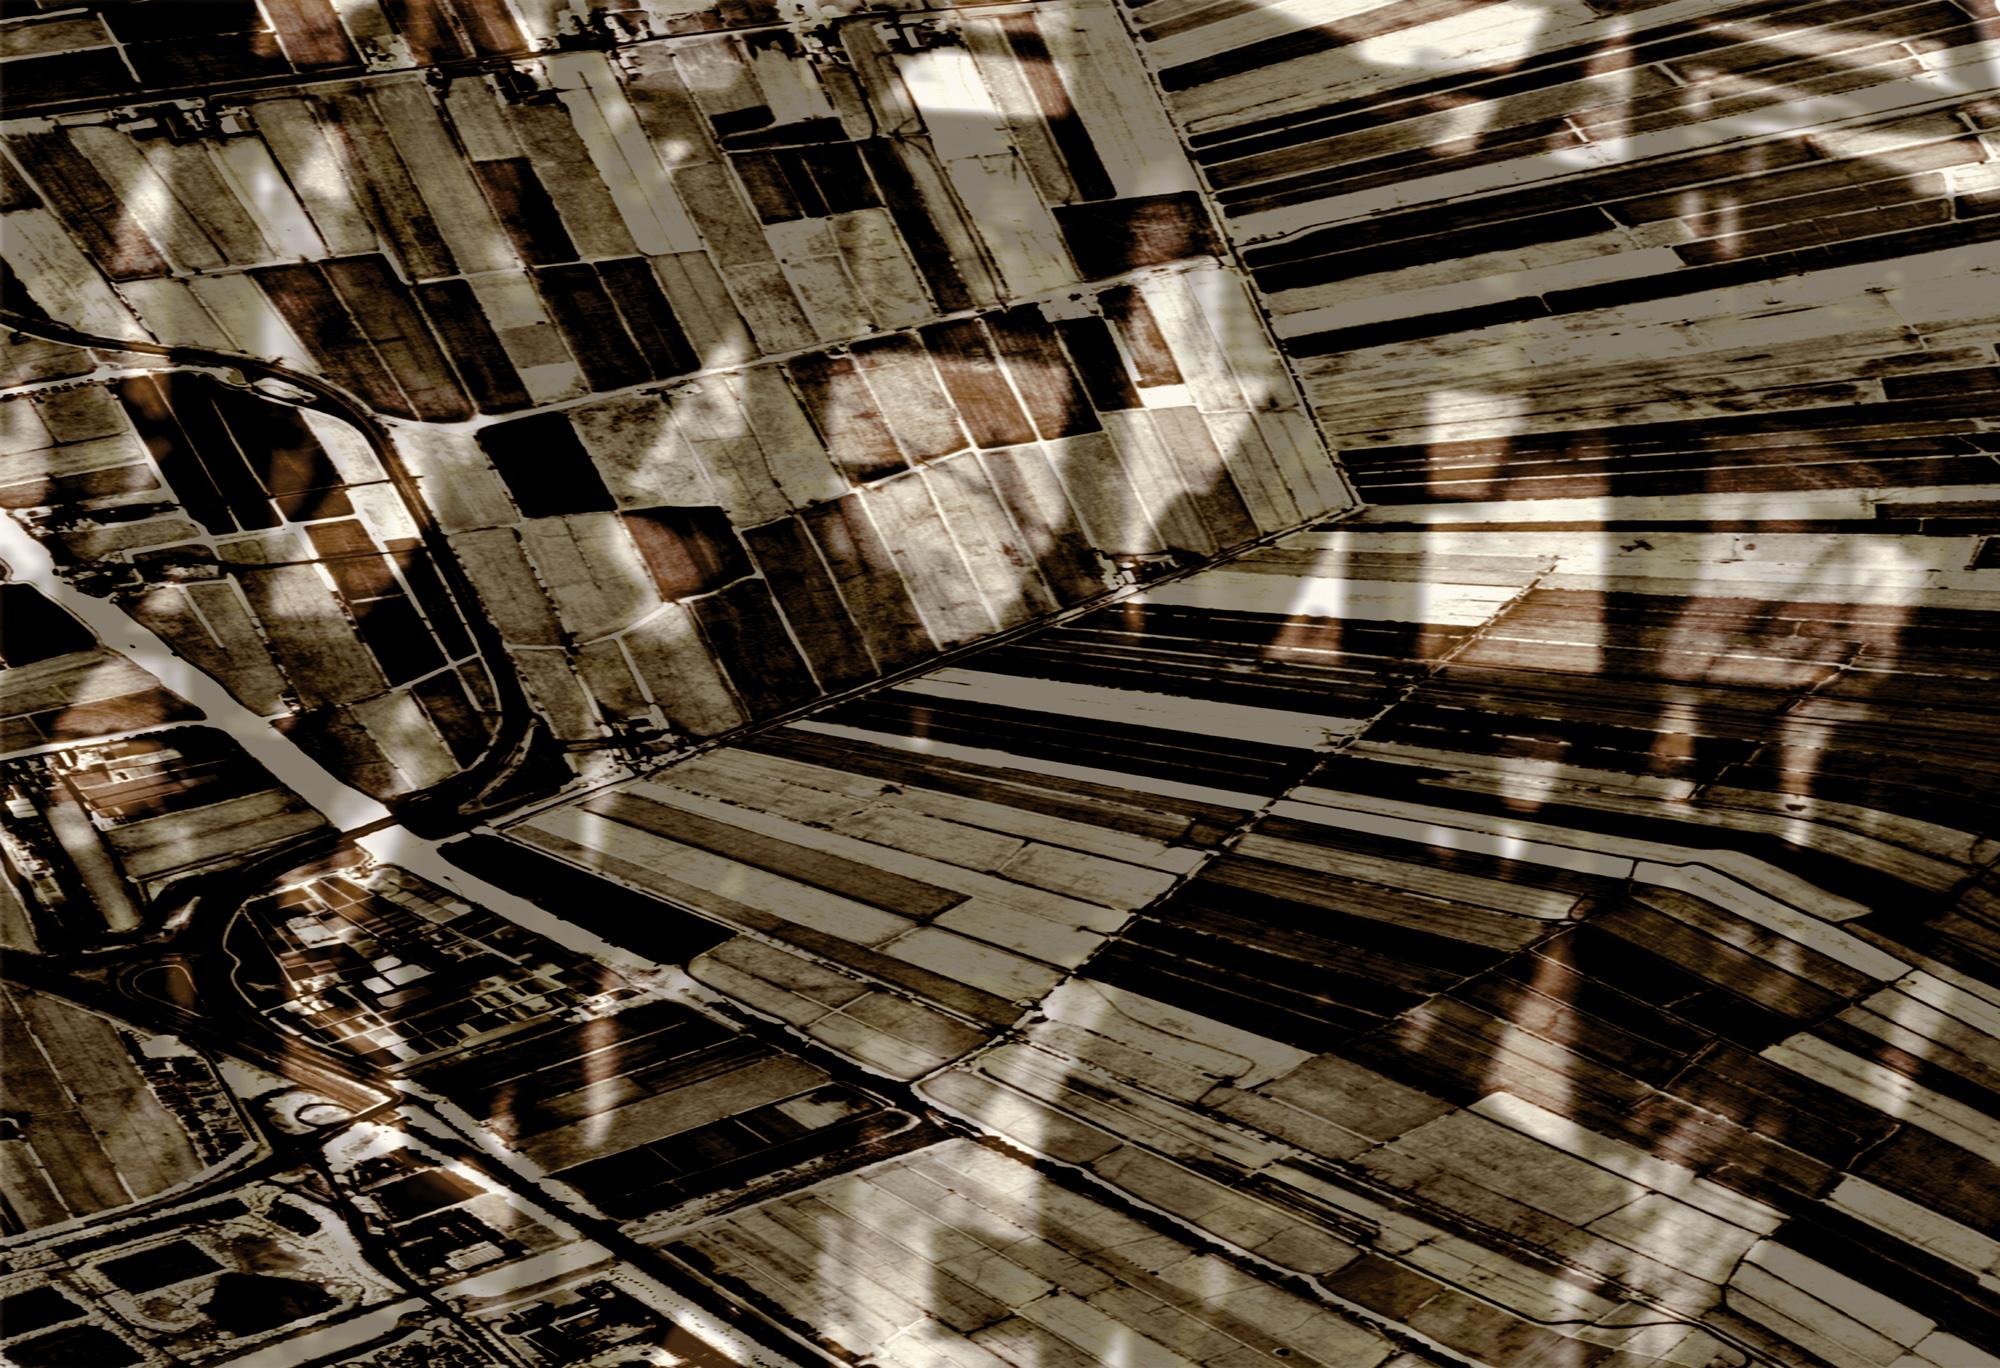 Land  Fall  (2001)  Foto op paneel, 120 x 80